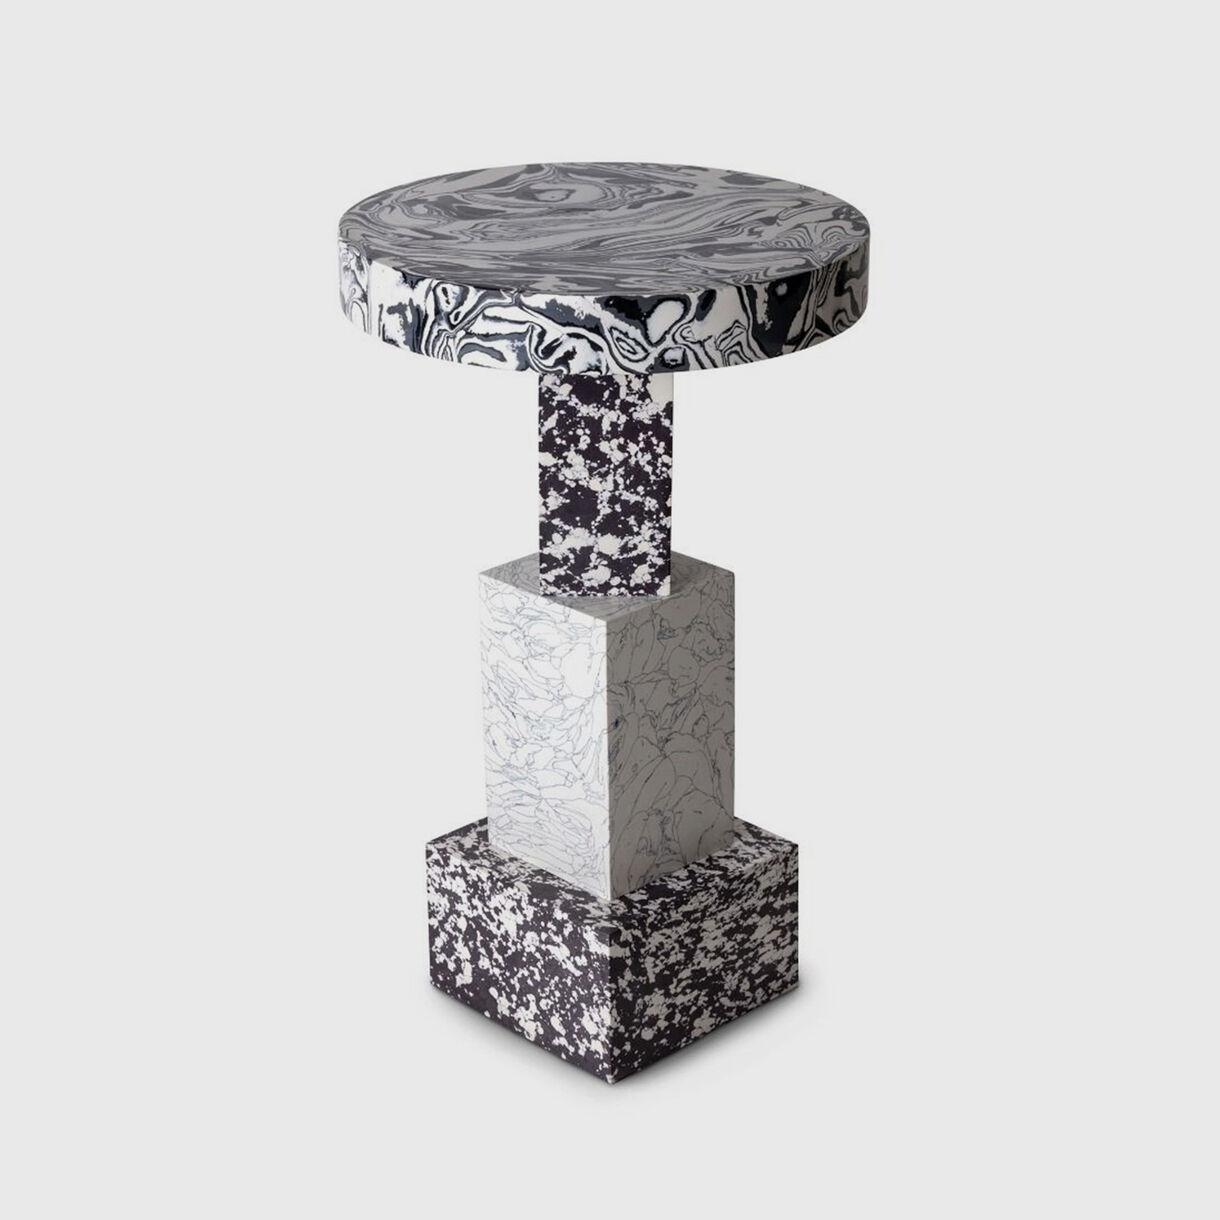 Swirl Table, Tall